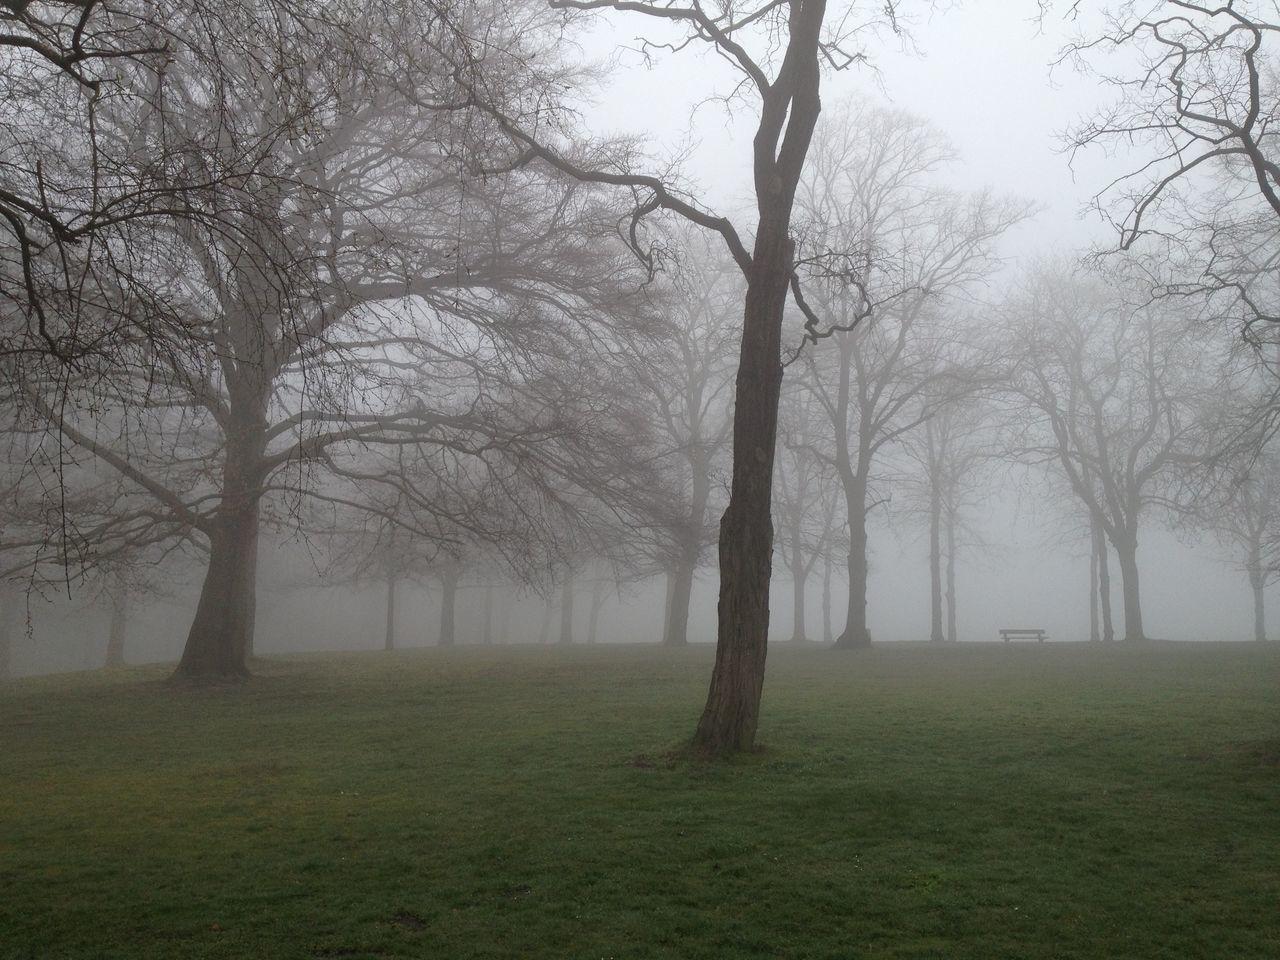 Vorsicht im Nebel Fog Foggy Forest Grass Hazy  Landscape Nature Nebel Scenics Tranquility Tree Wald